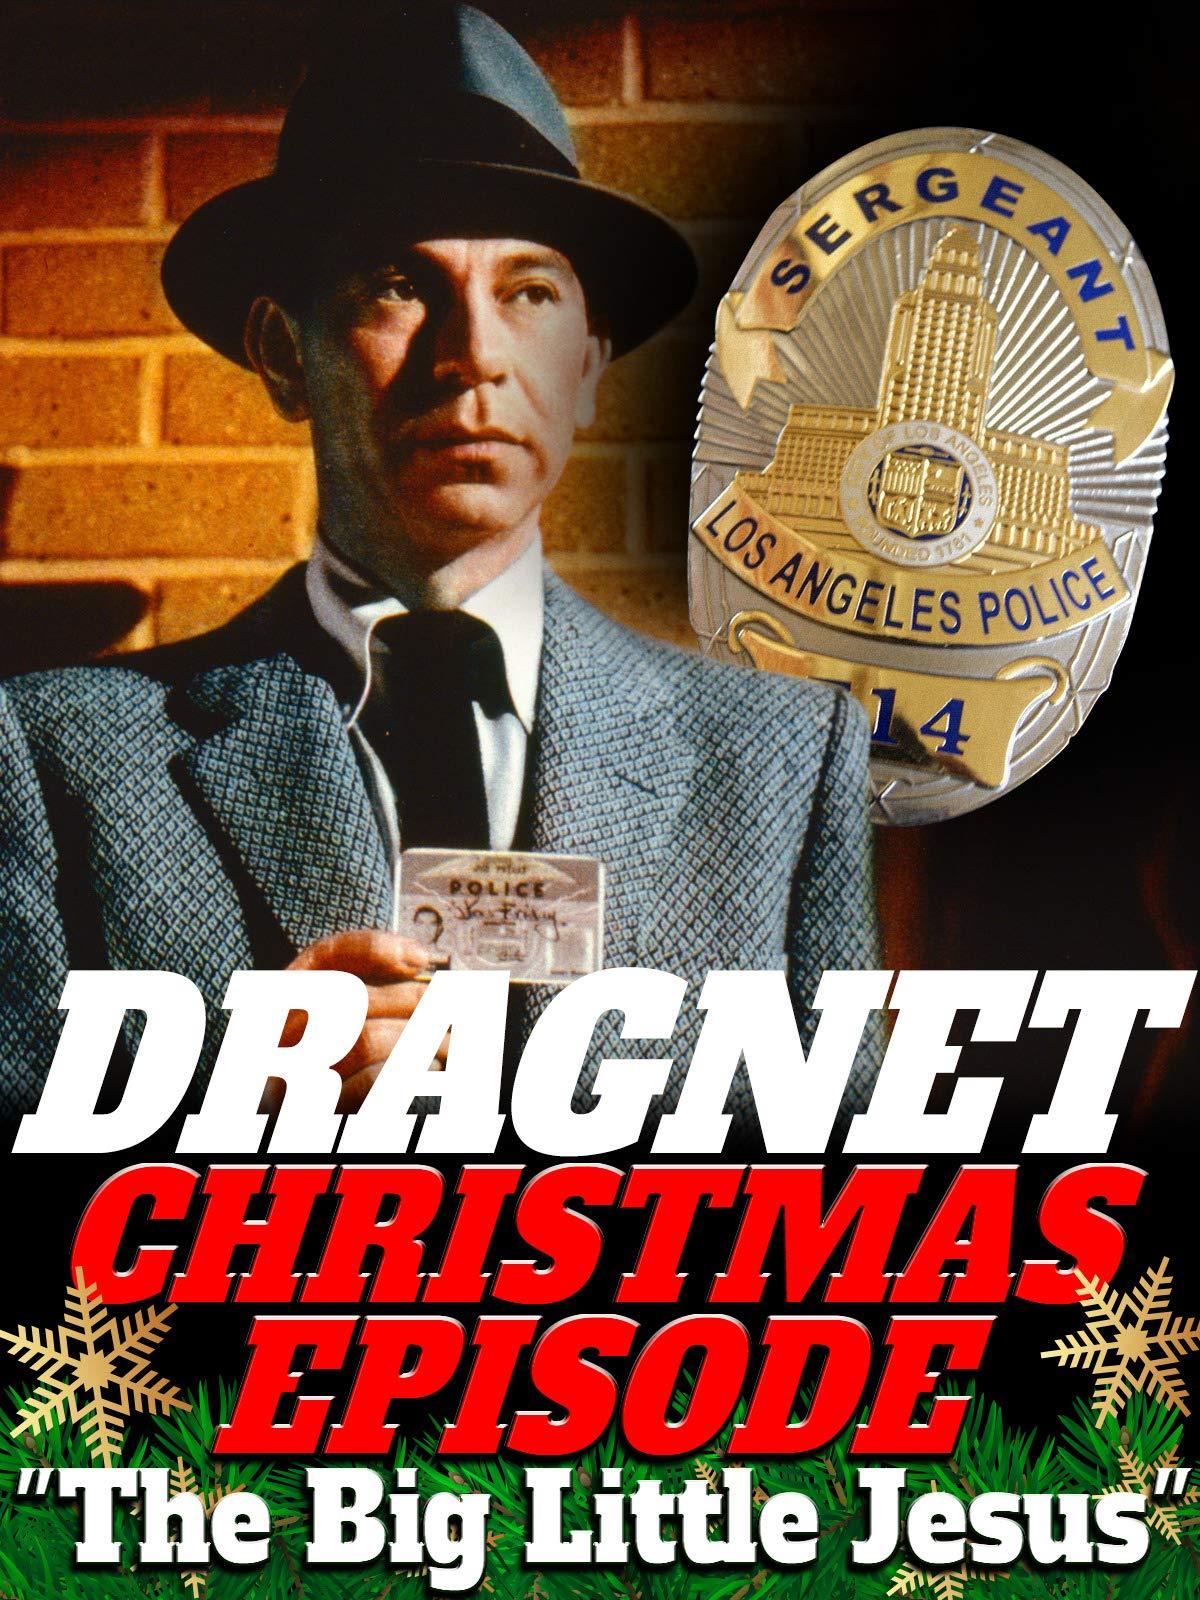 Dragnet Christmas Episode - The Big Little Jesus